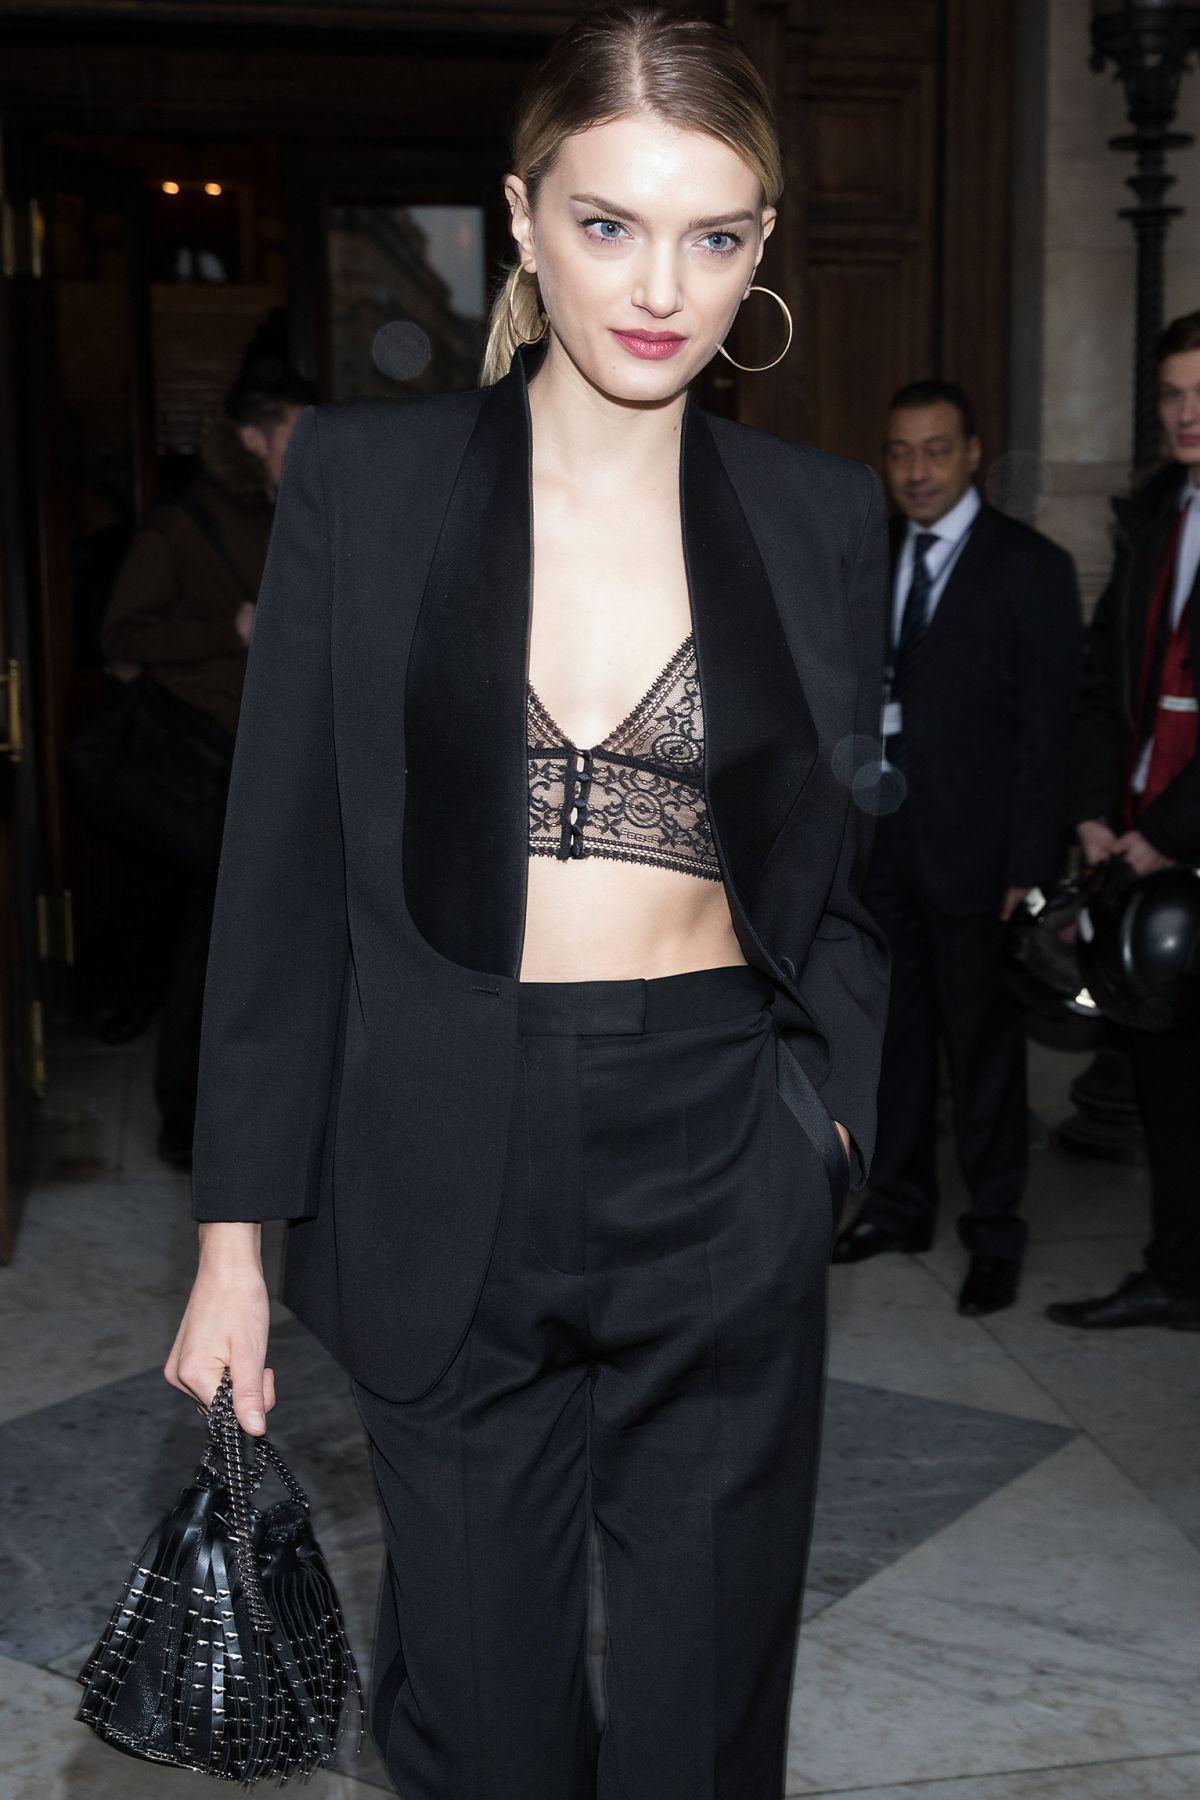 LILY DONALDSON Leaves Stella McCartney Fashion Show in Paris 03/06/2017